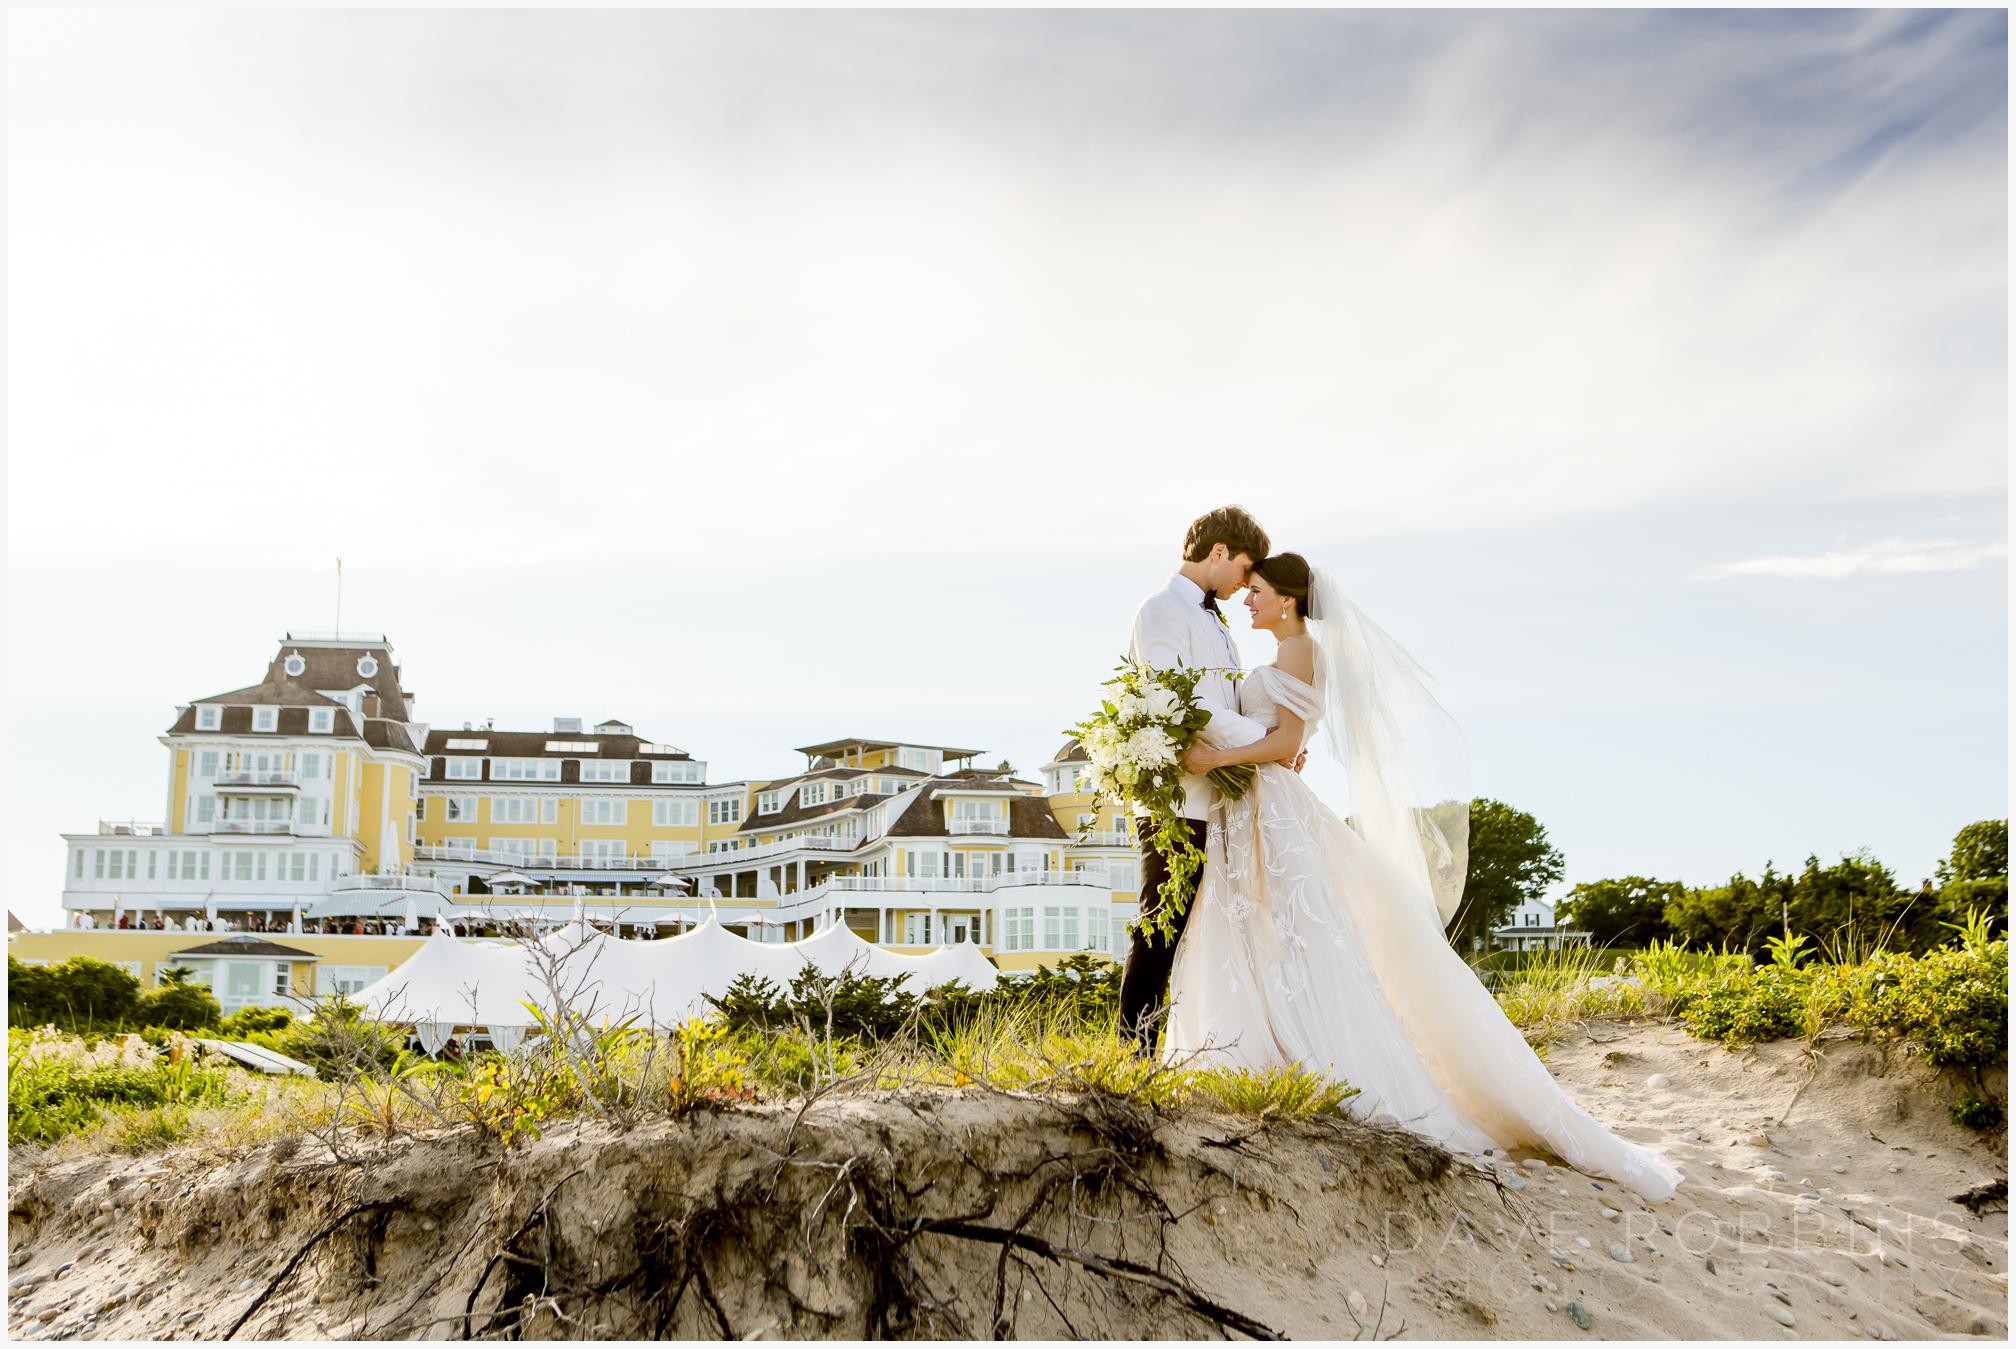 THE OCEAN HOUSE WEDDING 0071.JPG